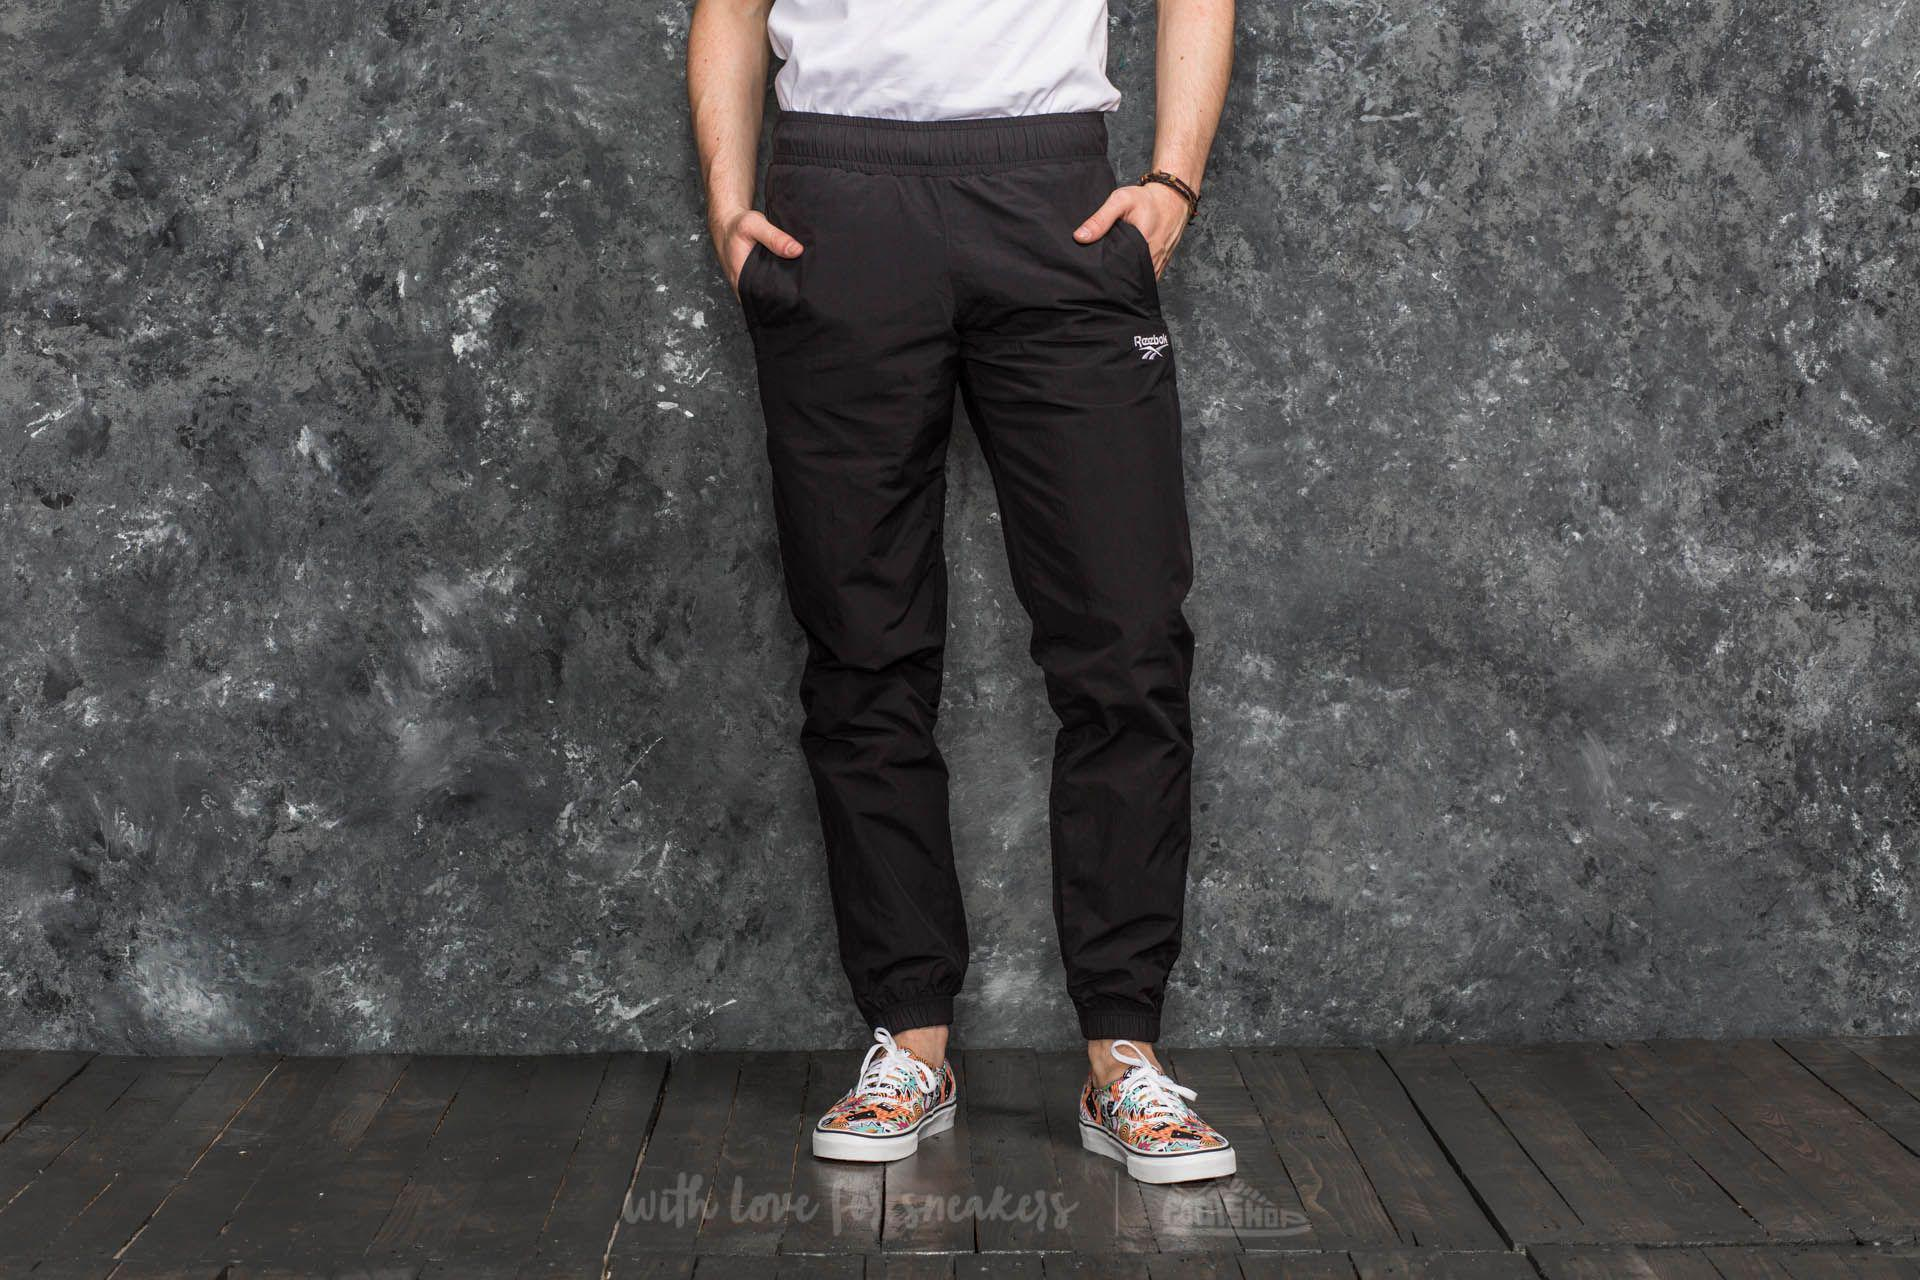 fcf9fb20a6340d Reebok Lf Vector Track Pant Black in Black for Men - Lyst